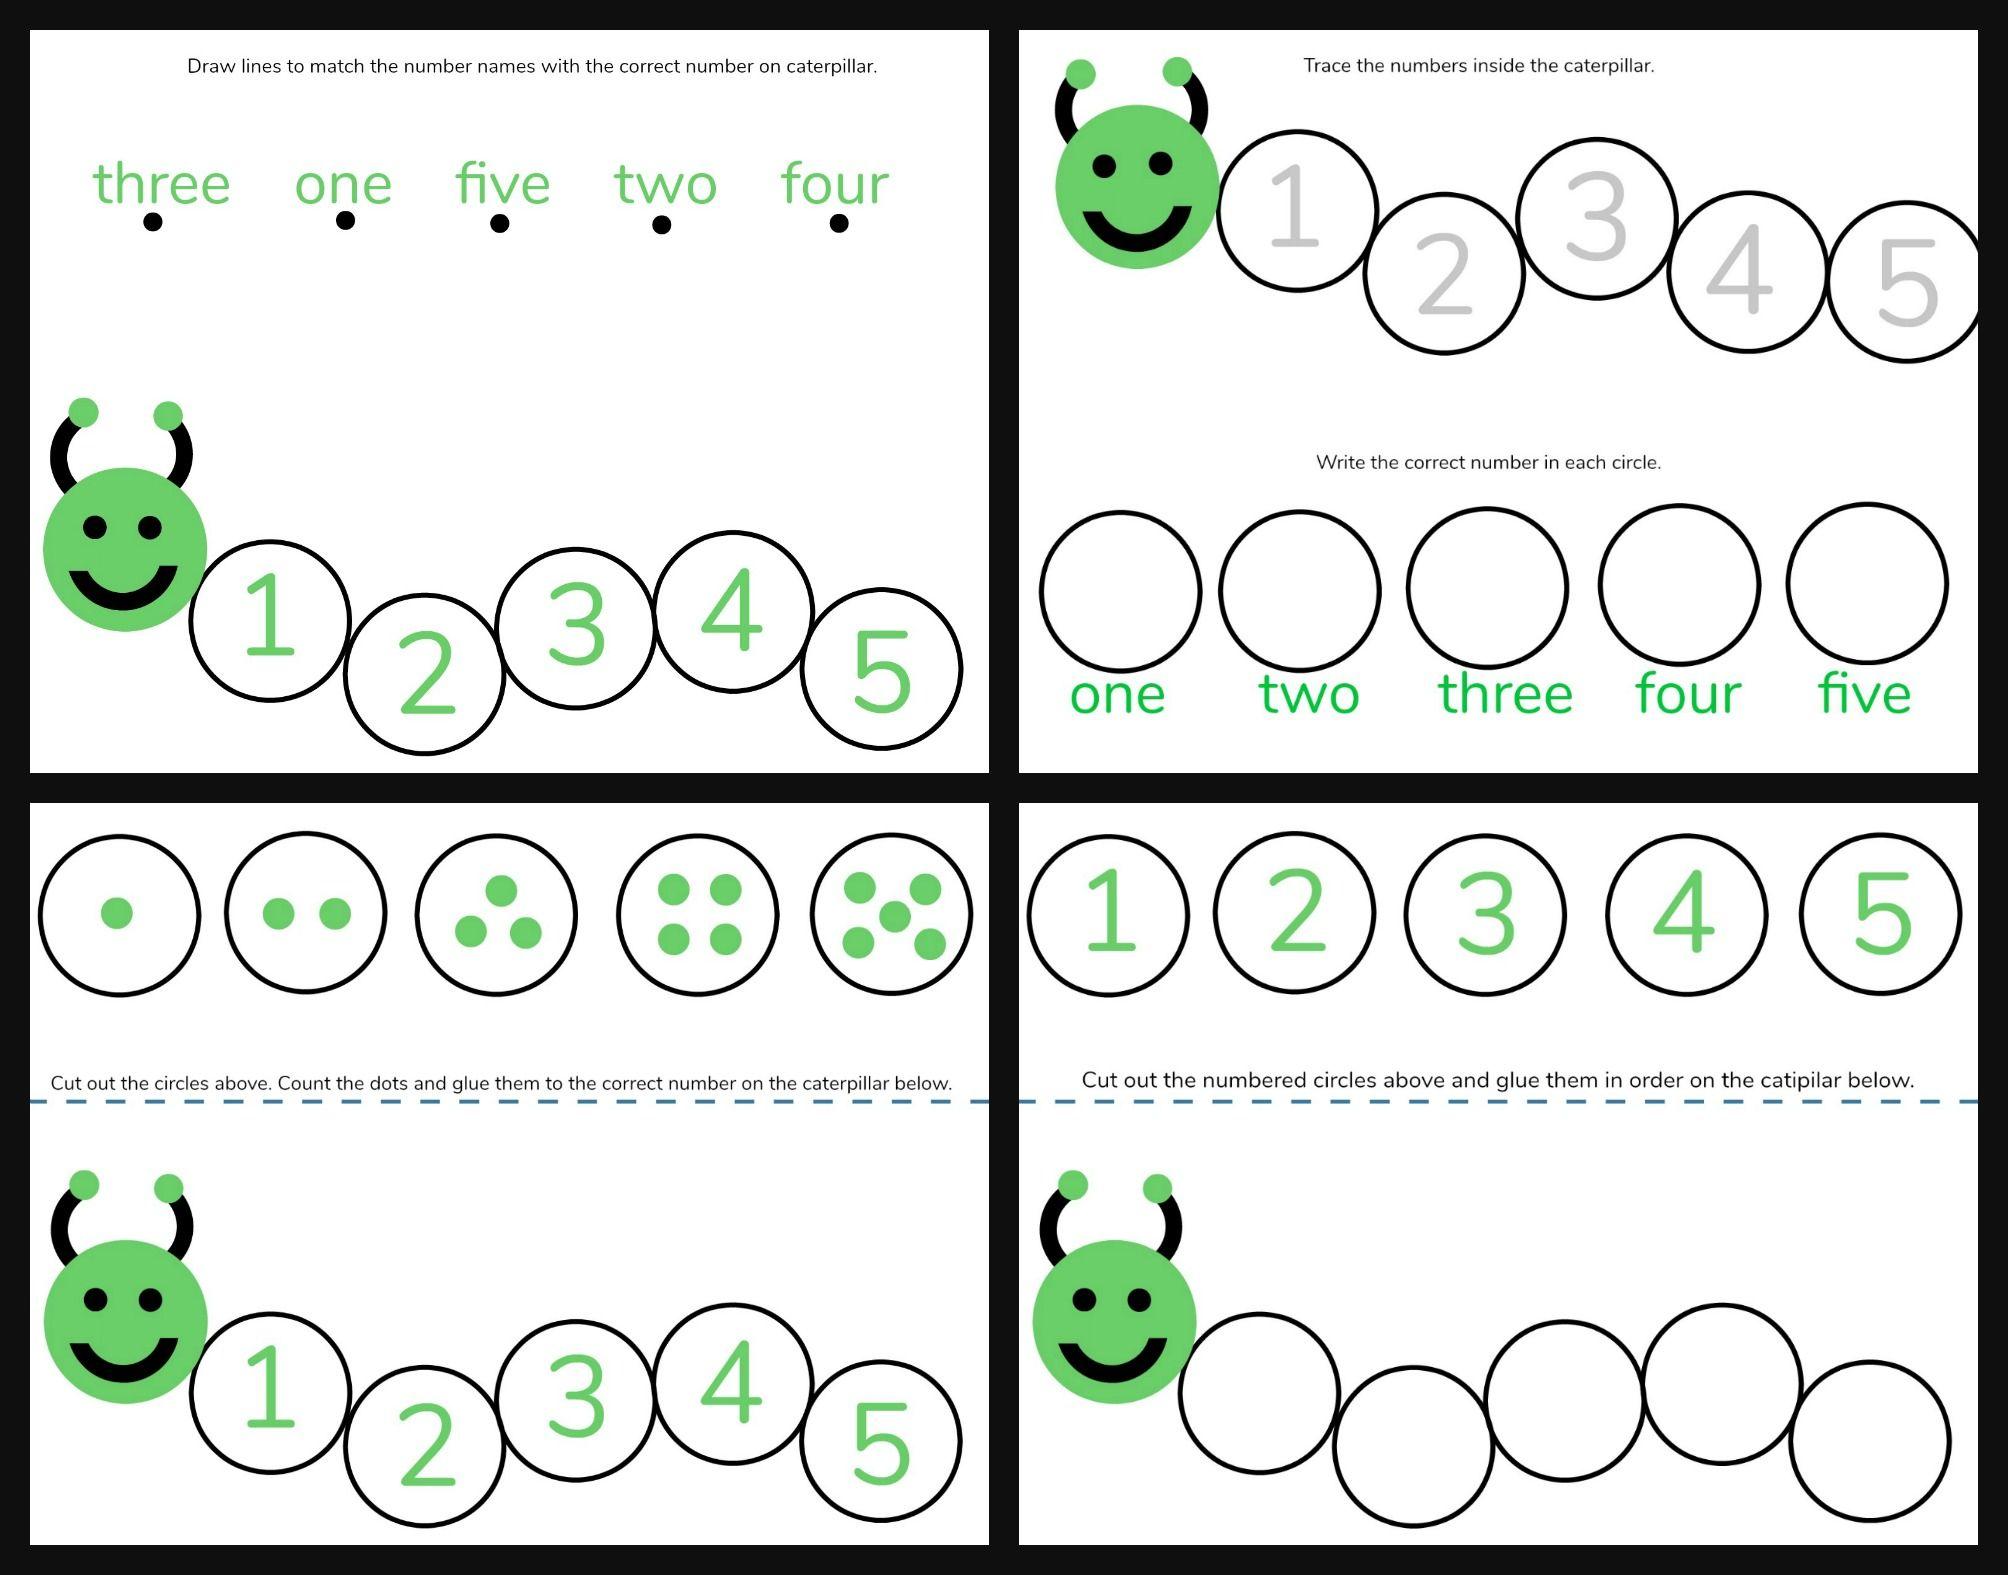 Caterpillar Math Free Printable Preschool Worksheets Numbers 1 5 Printable Preschool Worksheets Free Math Preschool Math Worksheets [ 1575 x 2008 Pixel ]